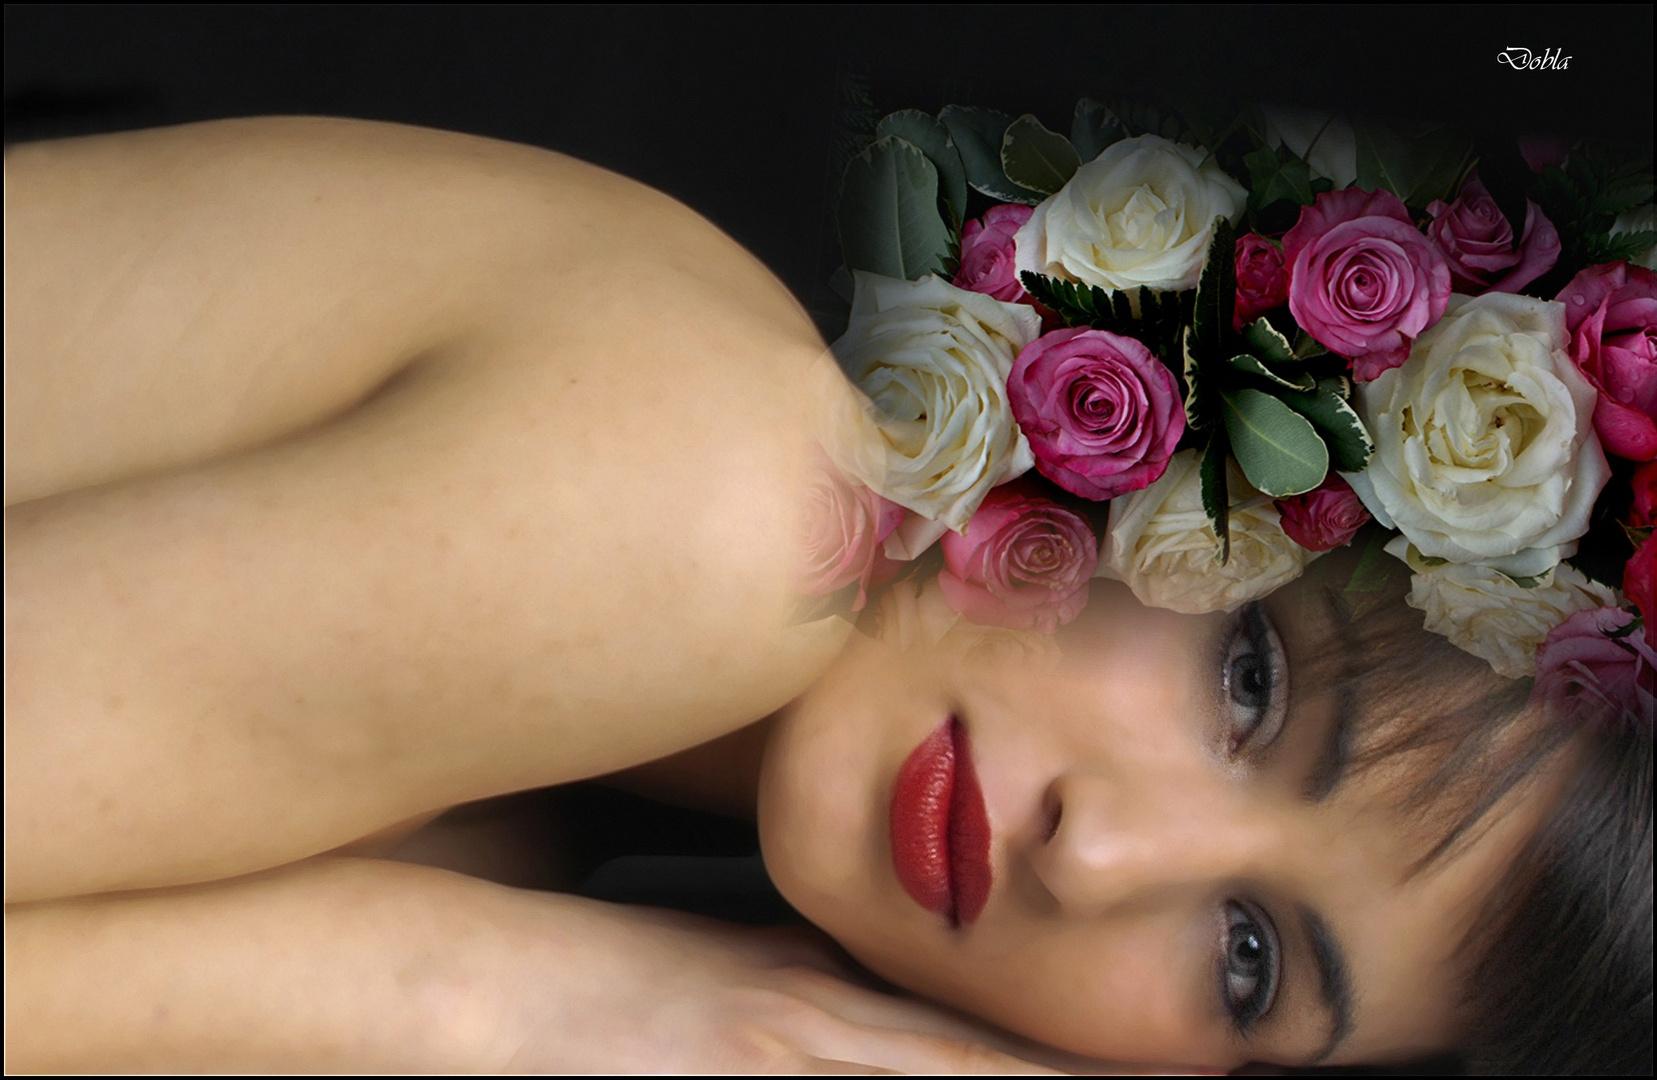 Carol 04 con flores de Rollmopchen